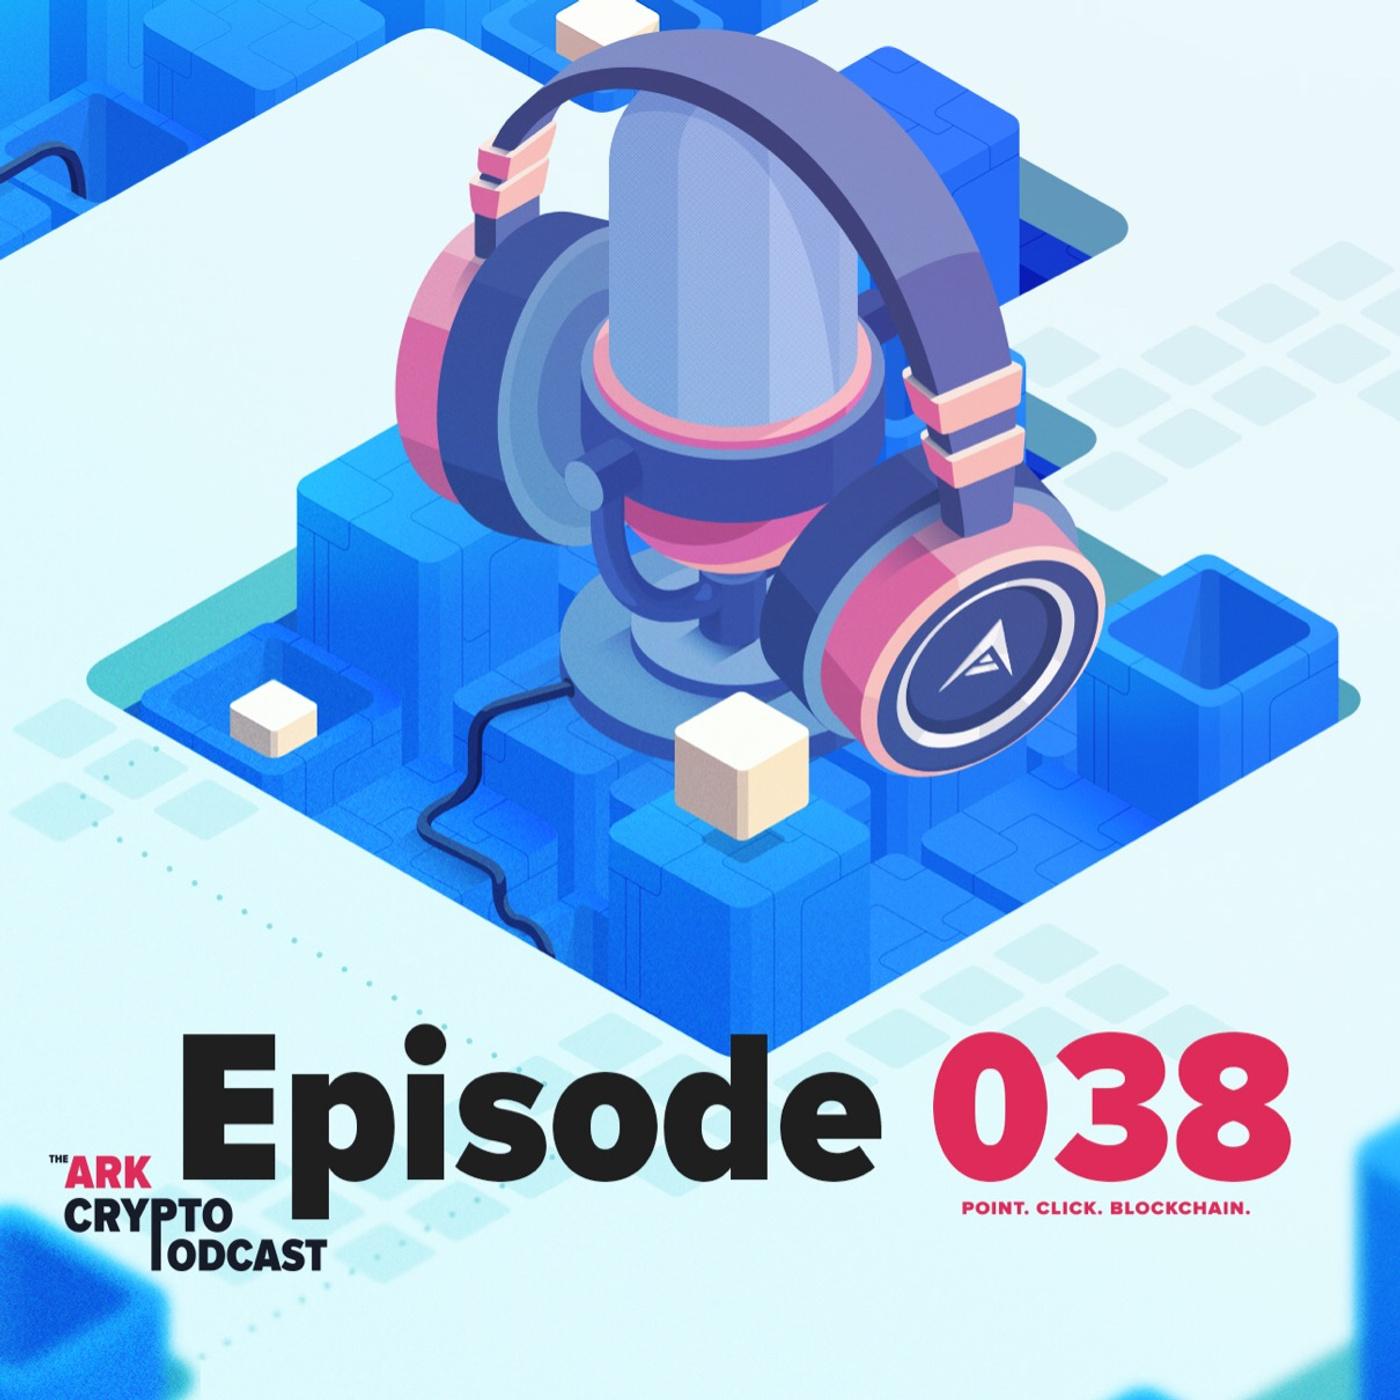 ARK Crypto Podcast #038 - Keys to Freedom Syndication & ARK Marketing Interviews